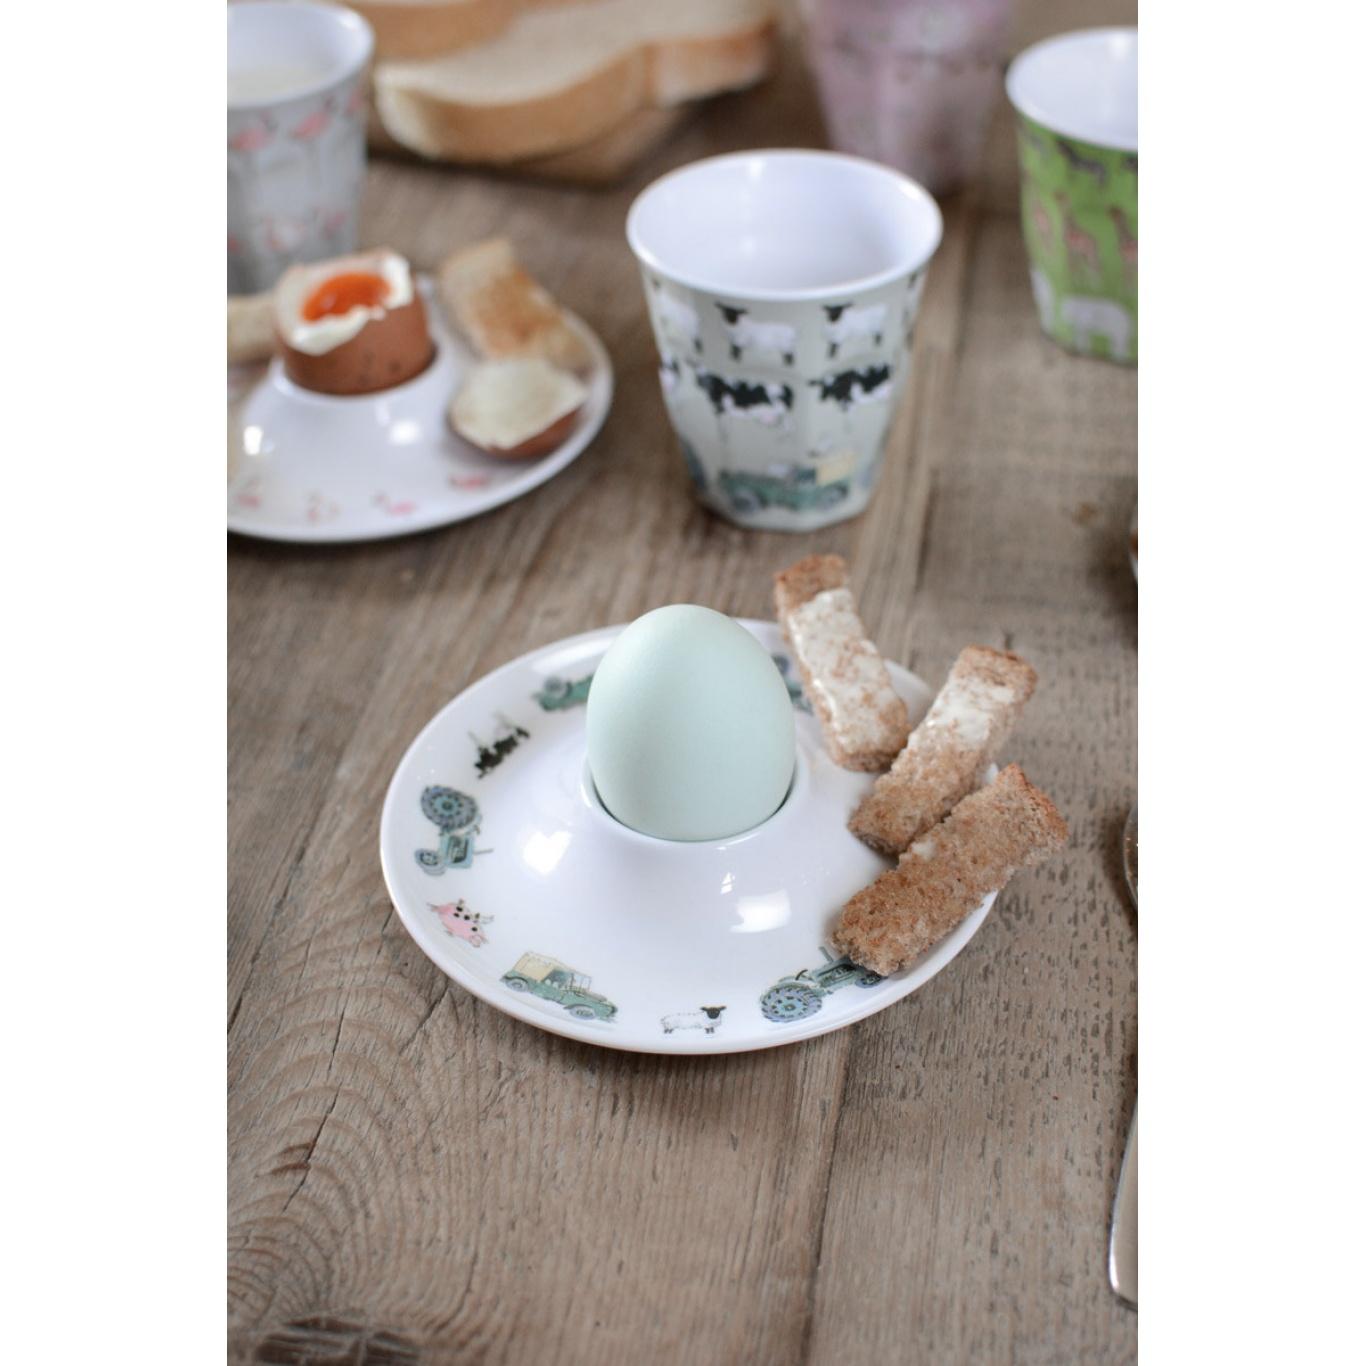 Sophie Allport On The Farm Kid's Melamine Egg Cup Saucer